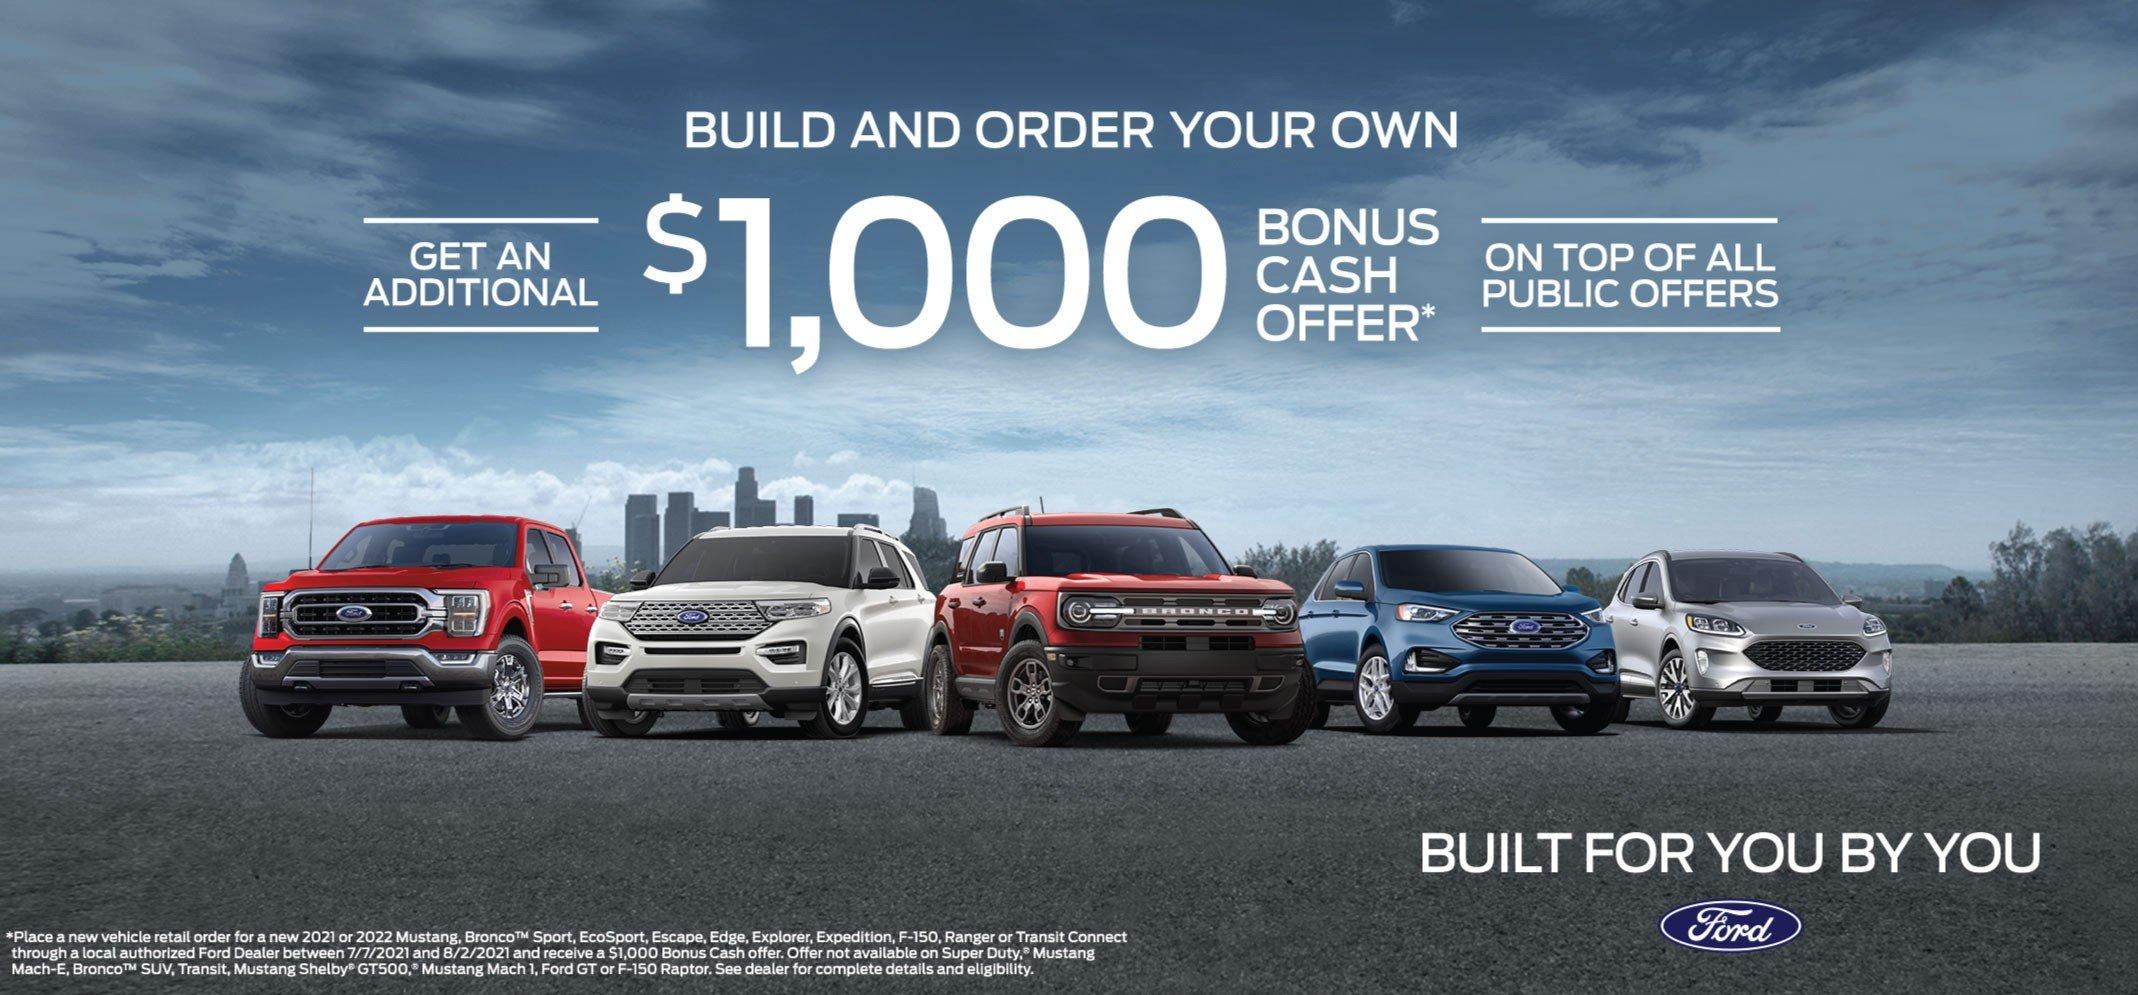 Bozard Ford Retail Order Incentive 8-2-21